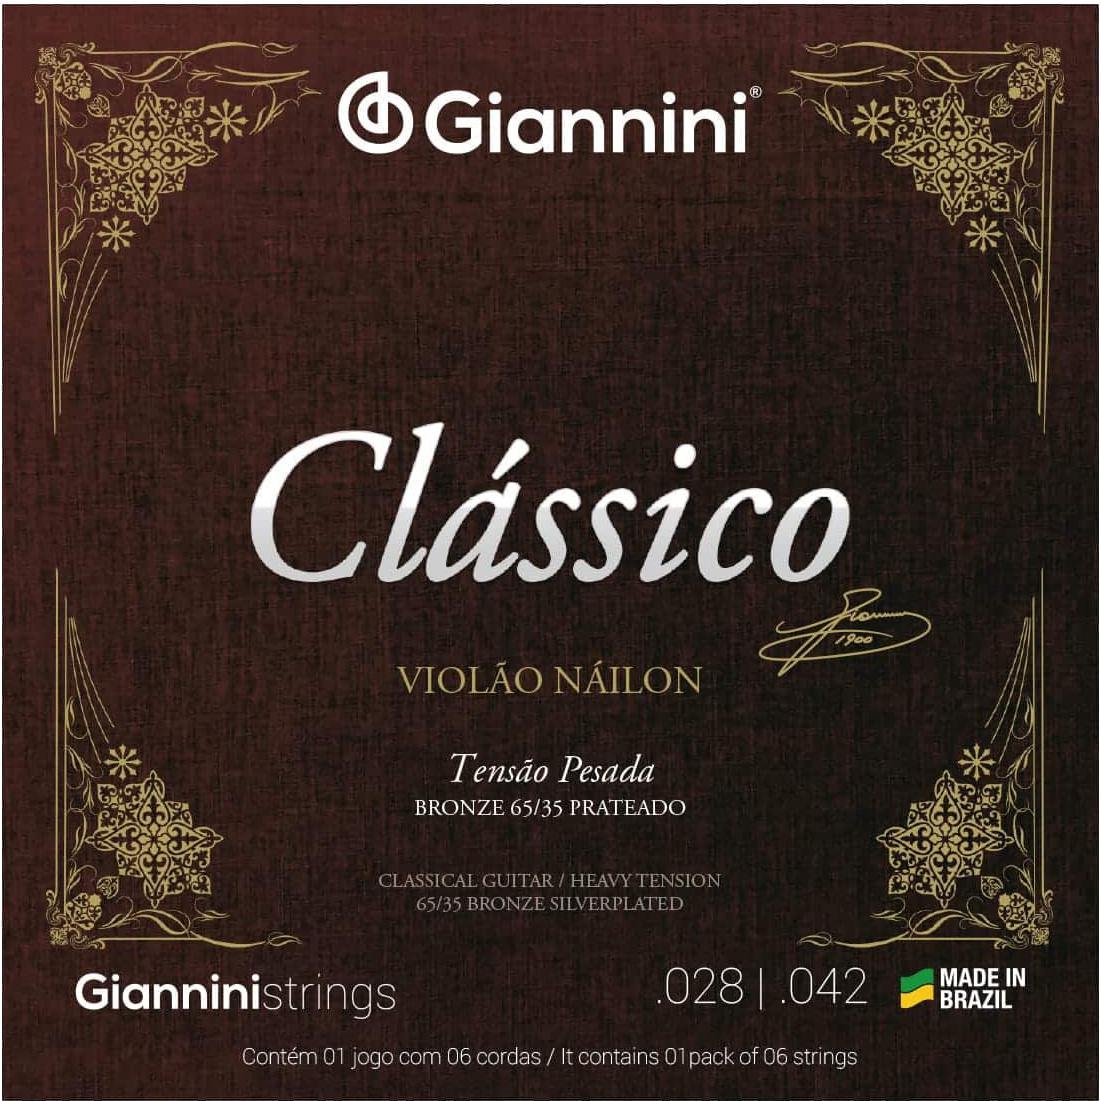 Encordoamento para Violão Nylon Giannini - GENWPA (Tensão Alta)